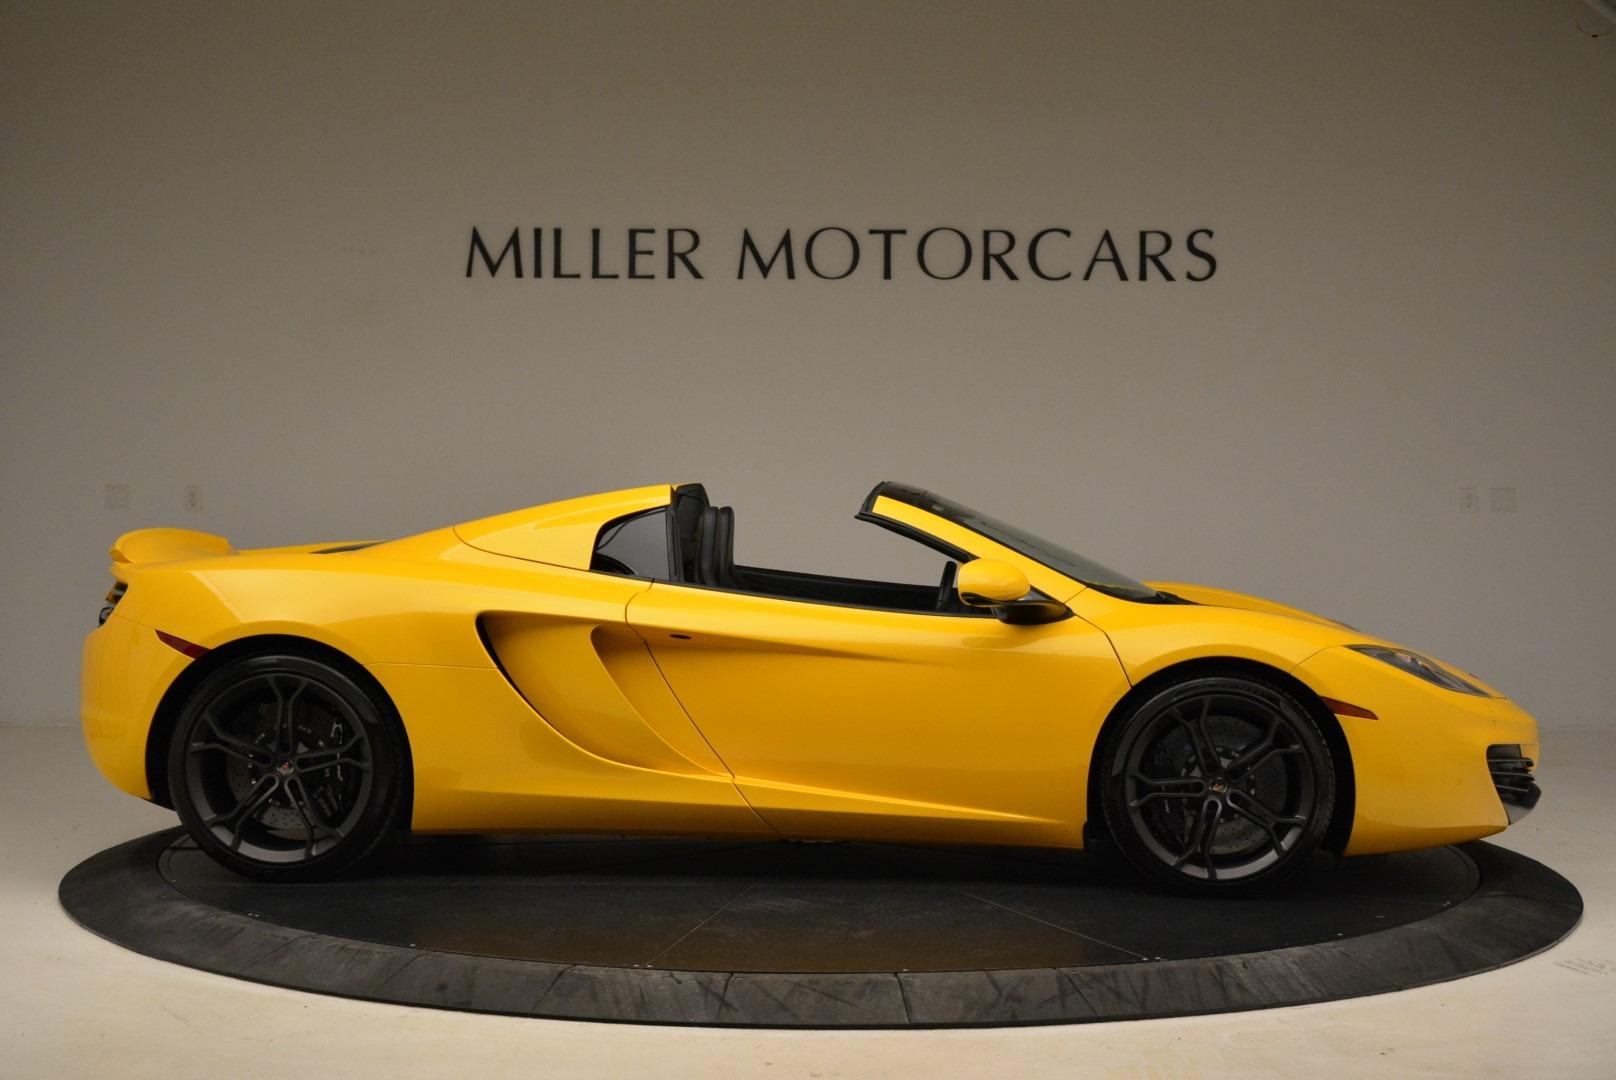 Used 2014 McLaren MP4-12C Spider For Sale In Greenwich, CT. Alfa Romeo of Greenwich, 3134 2057_p9